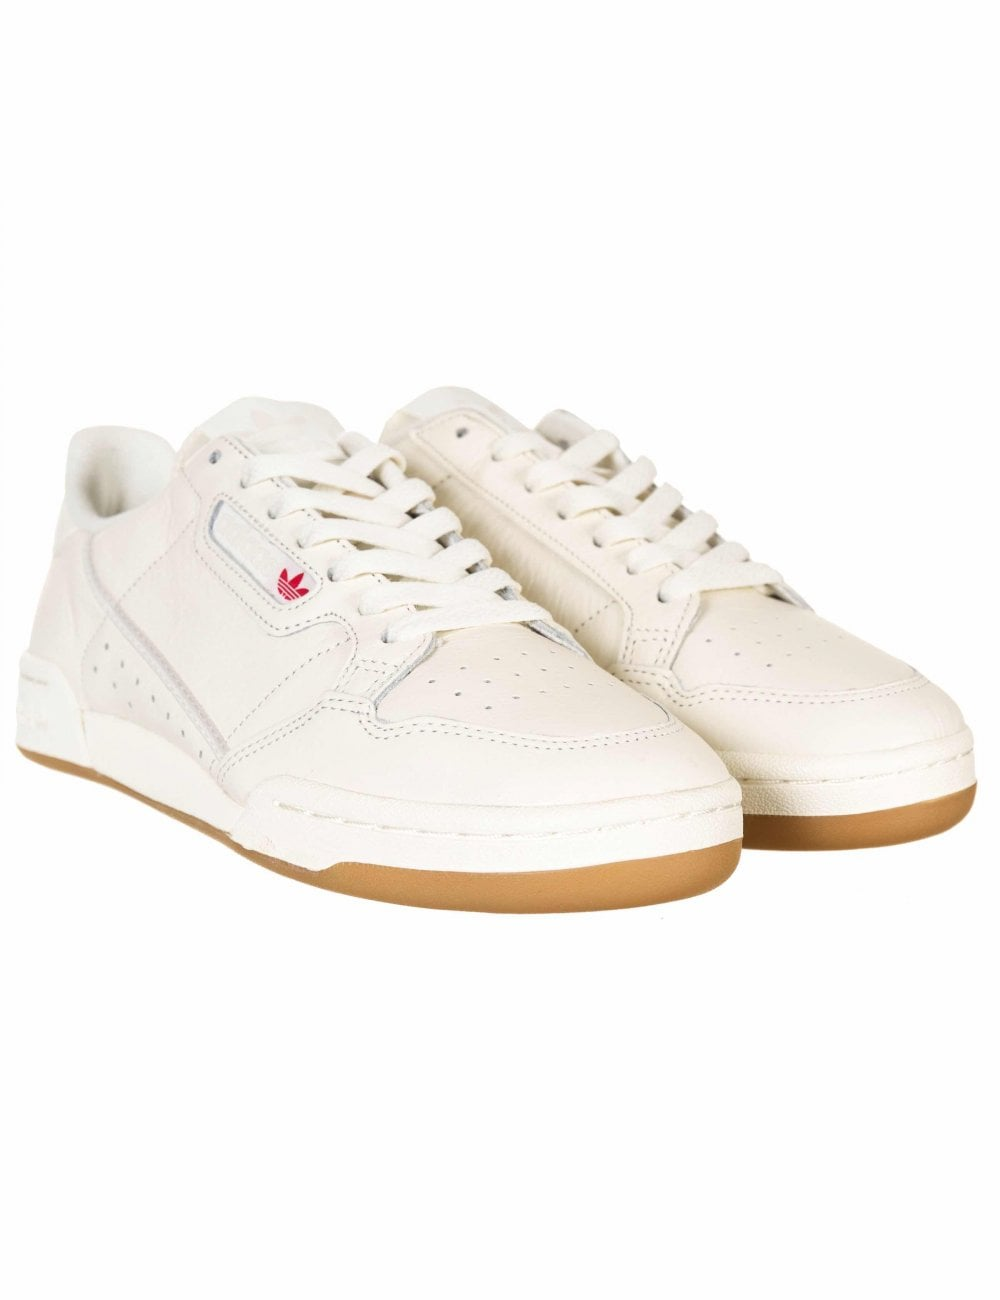 c8e75b03d Adidas Originals Continental 80 Trainers - Off White/Raw Gum ...